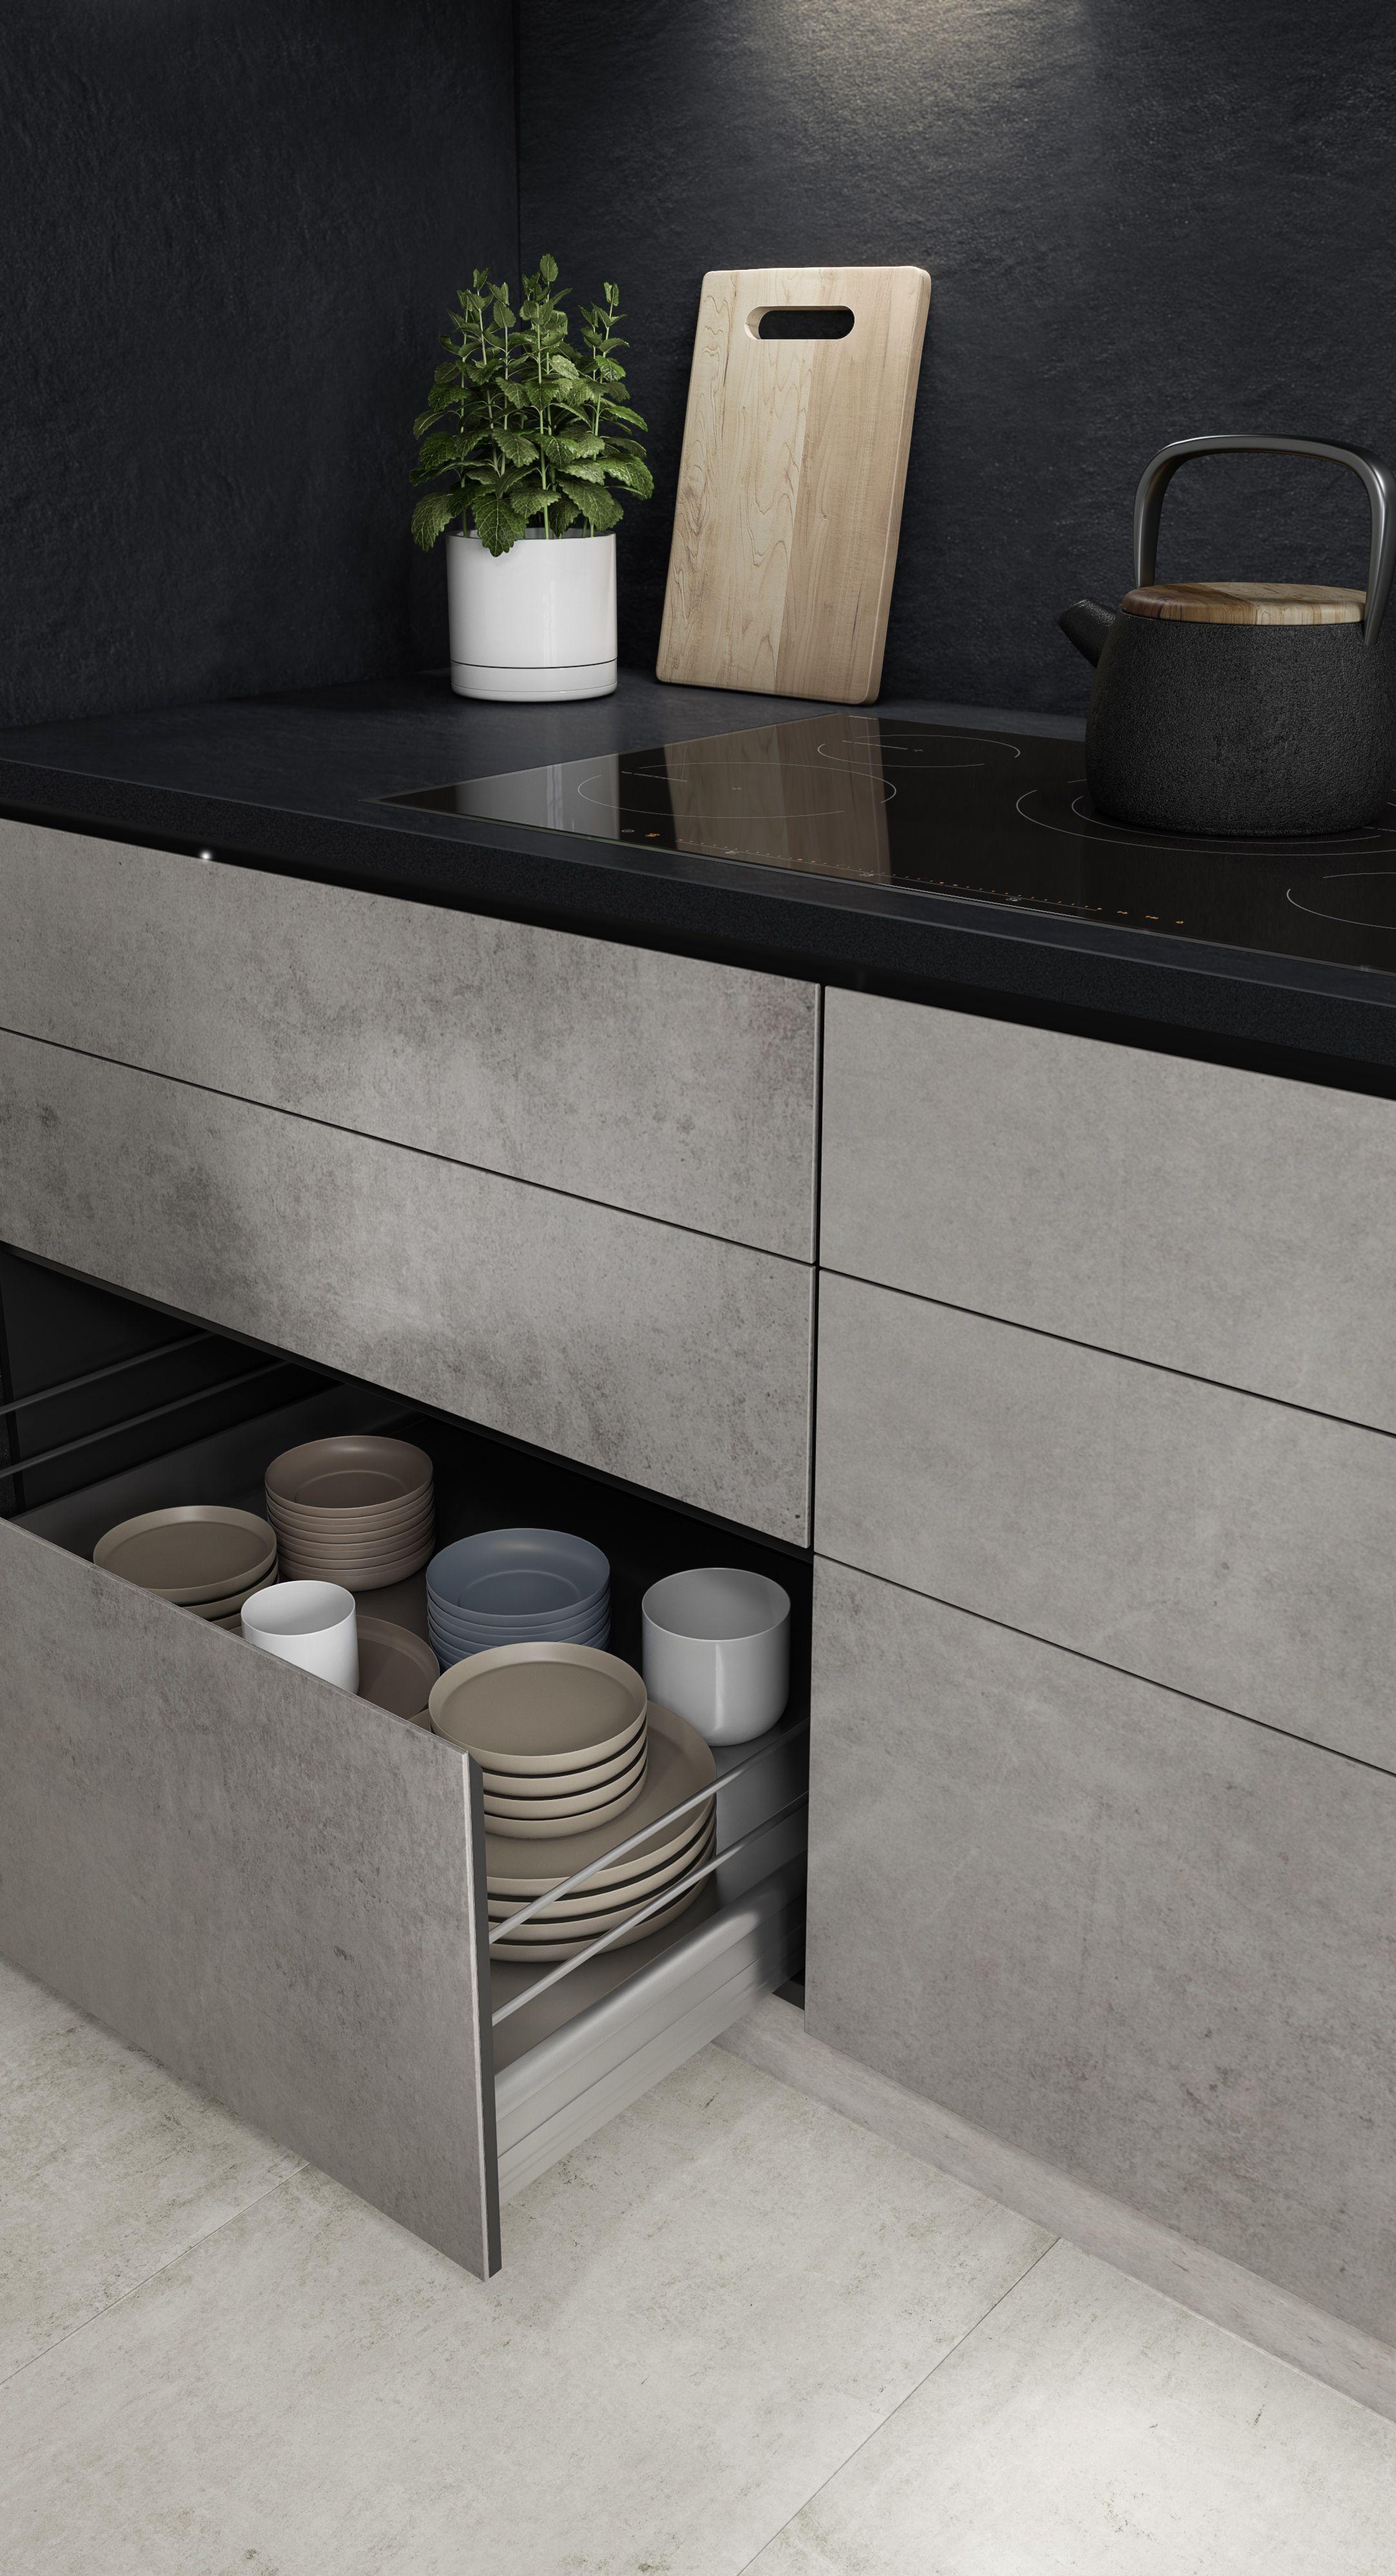 Dekton Slim by Cosentino surfaces. Dark backsplash and countertop with grey cabinets.